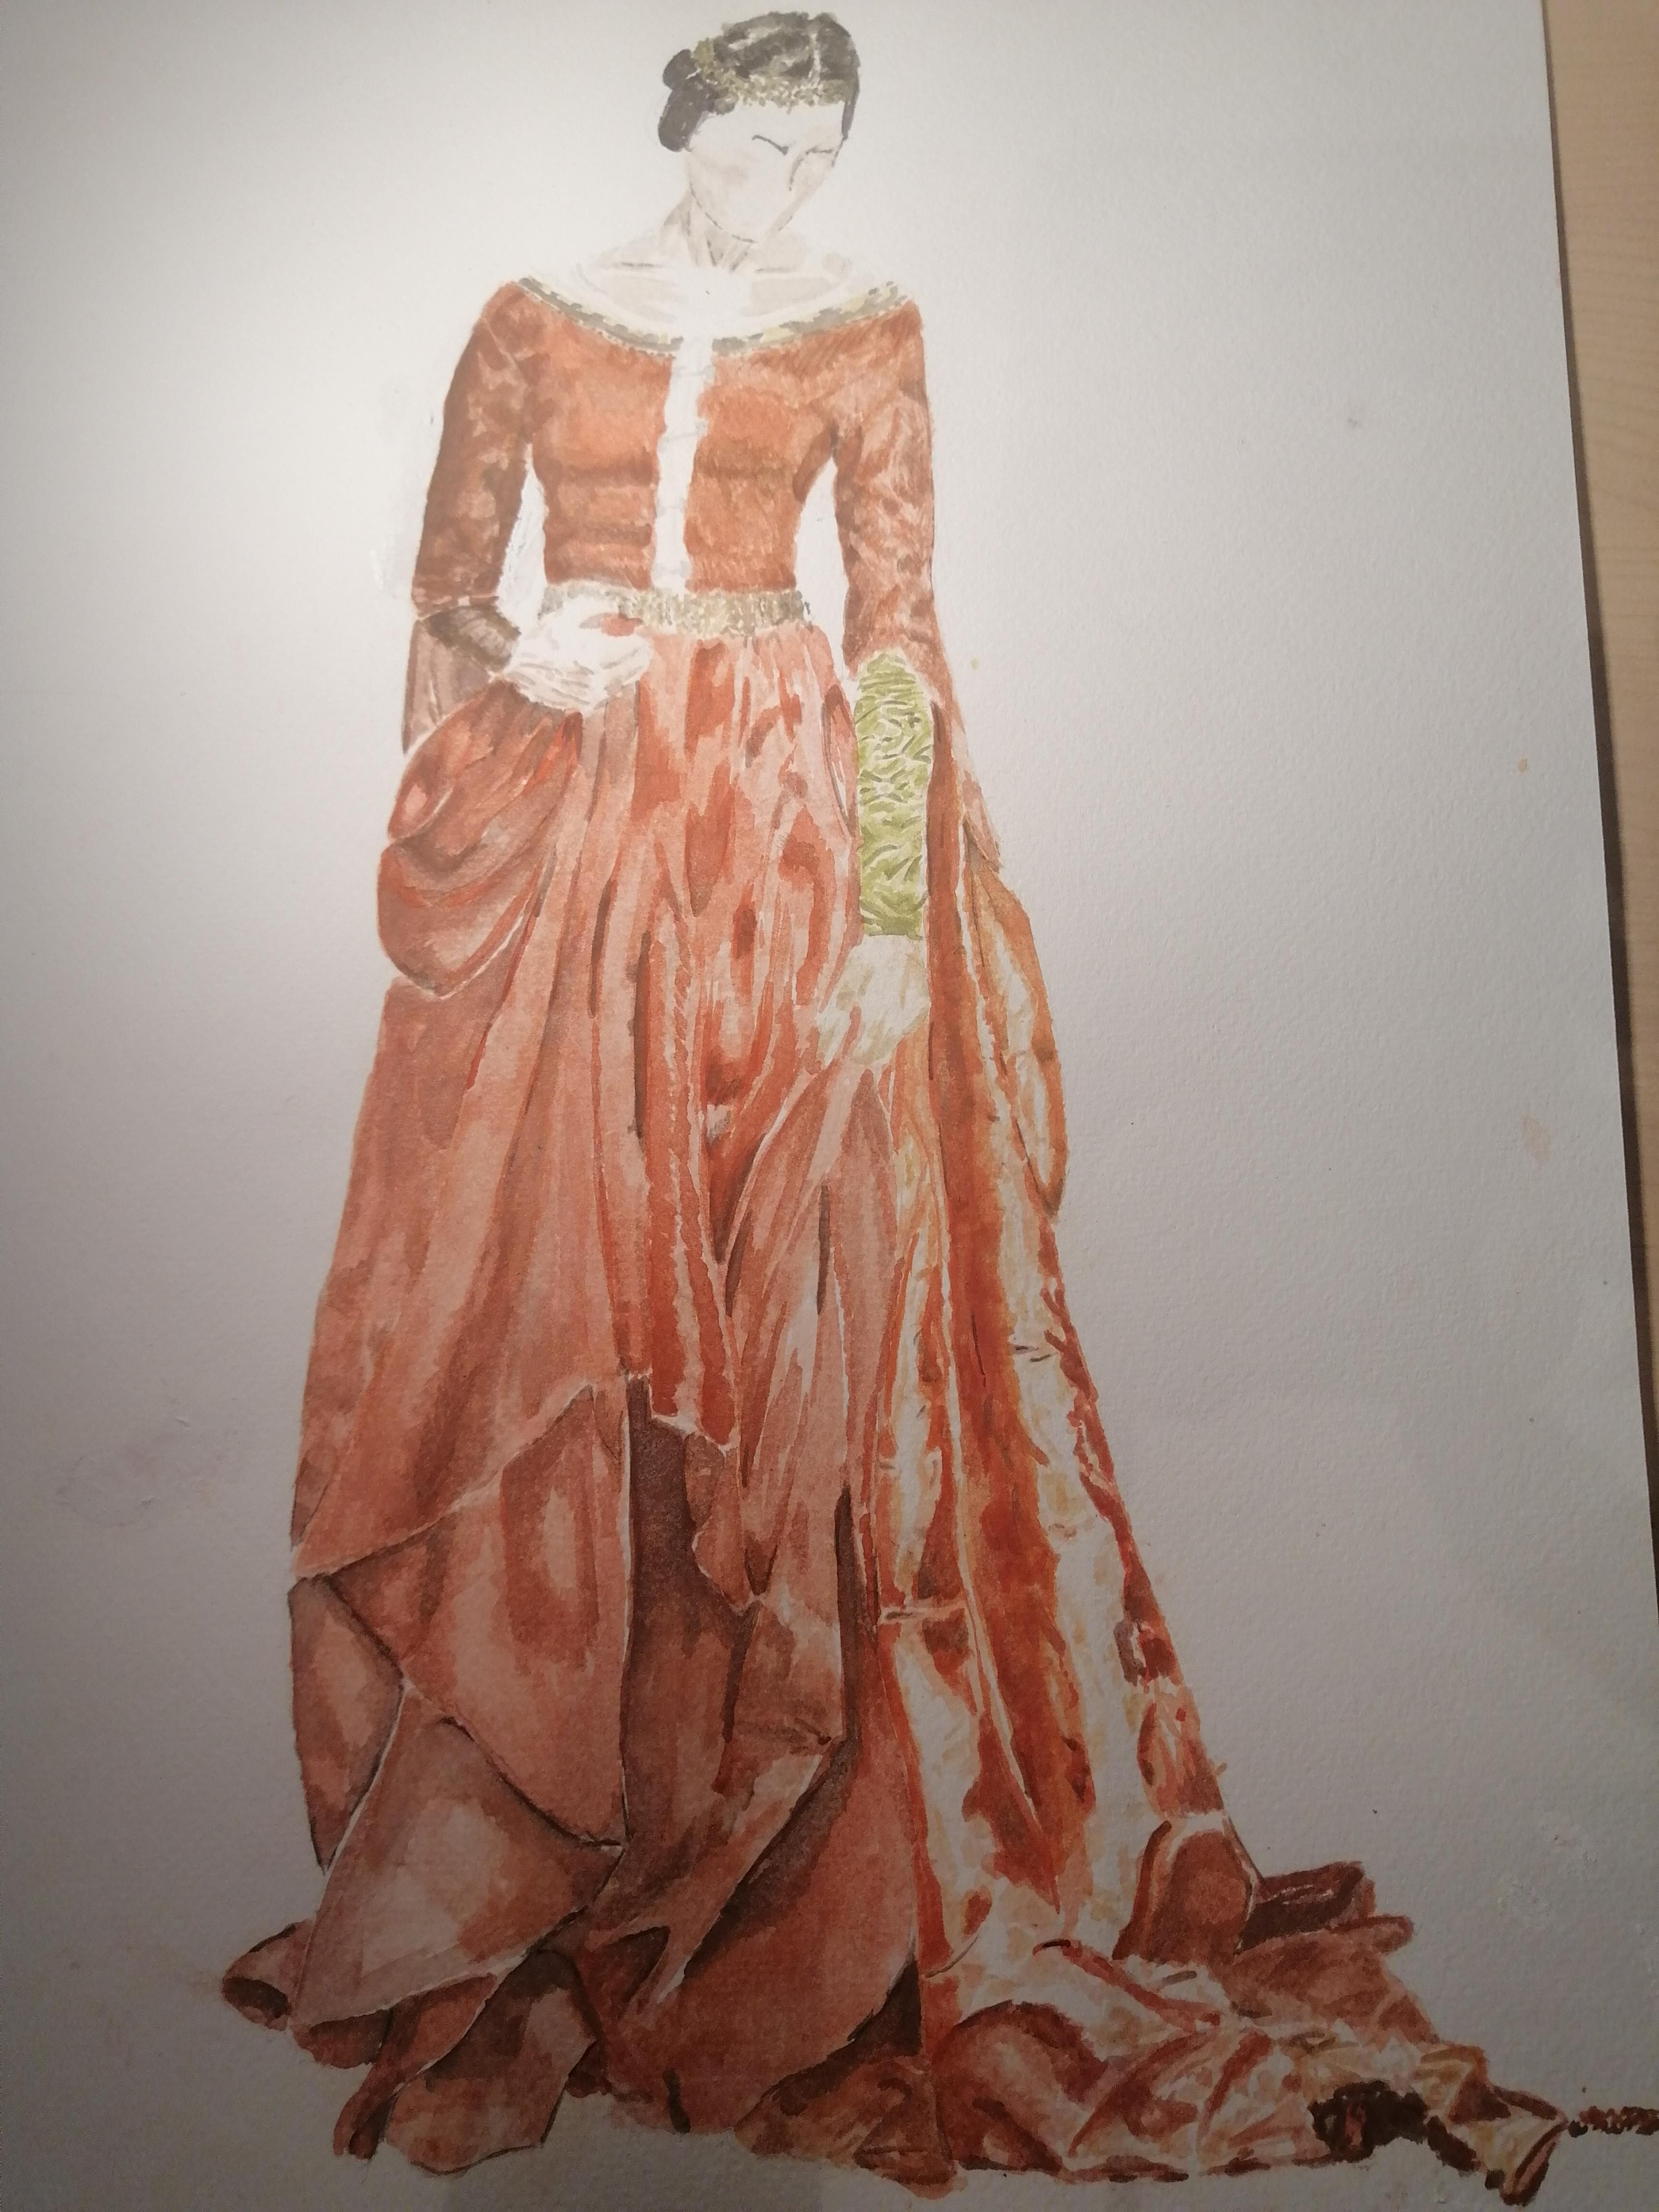 Bernadette banners medieval dress watercolor me 2020 art